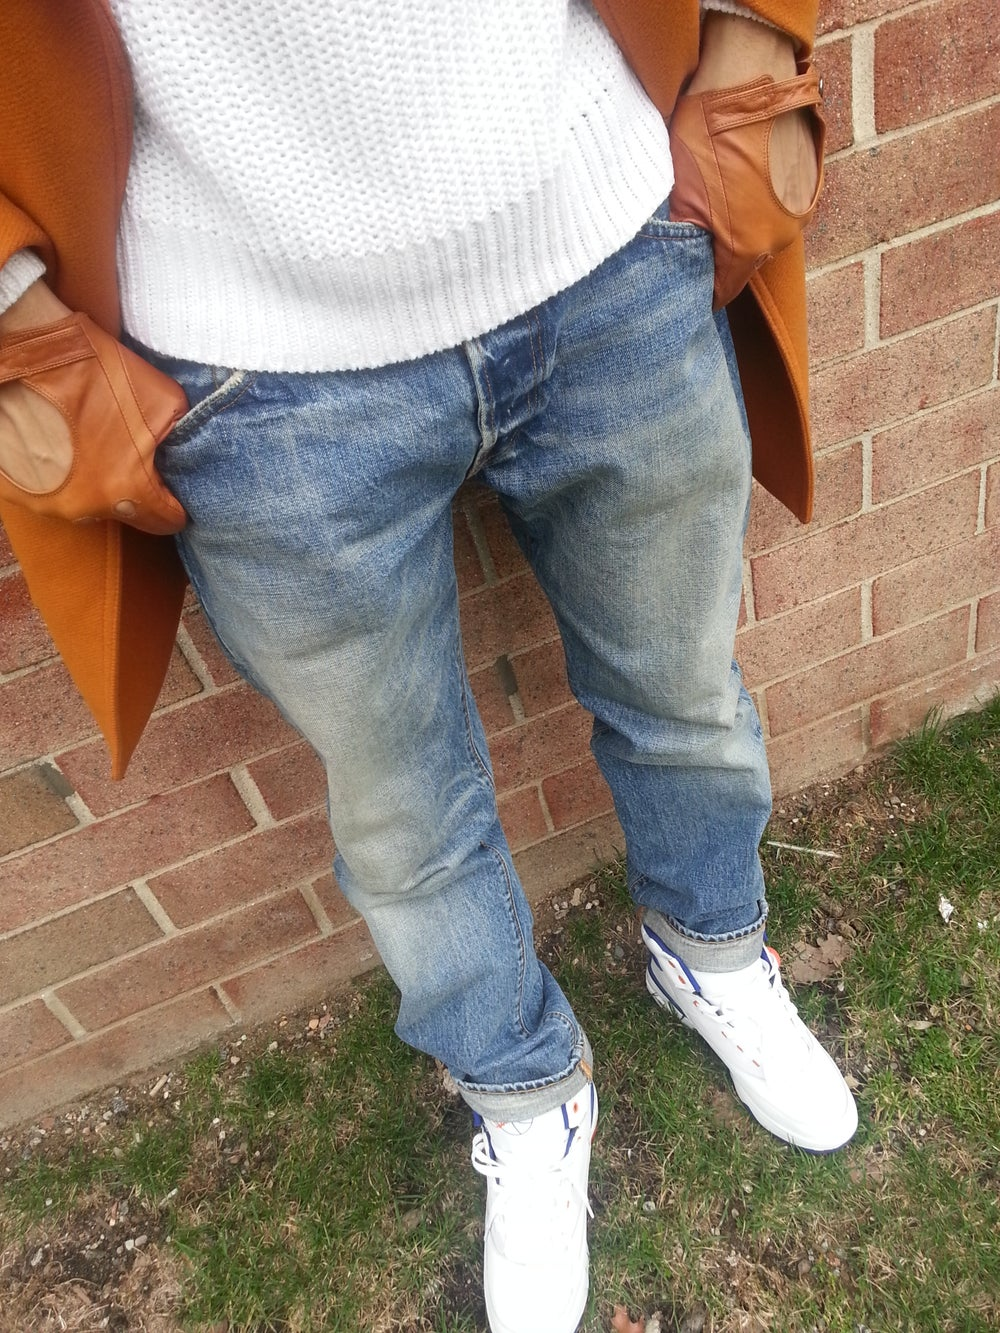 Image of Vintage Evisu jeans men's size 34